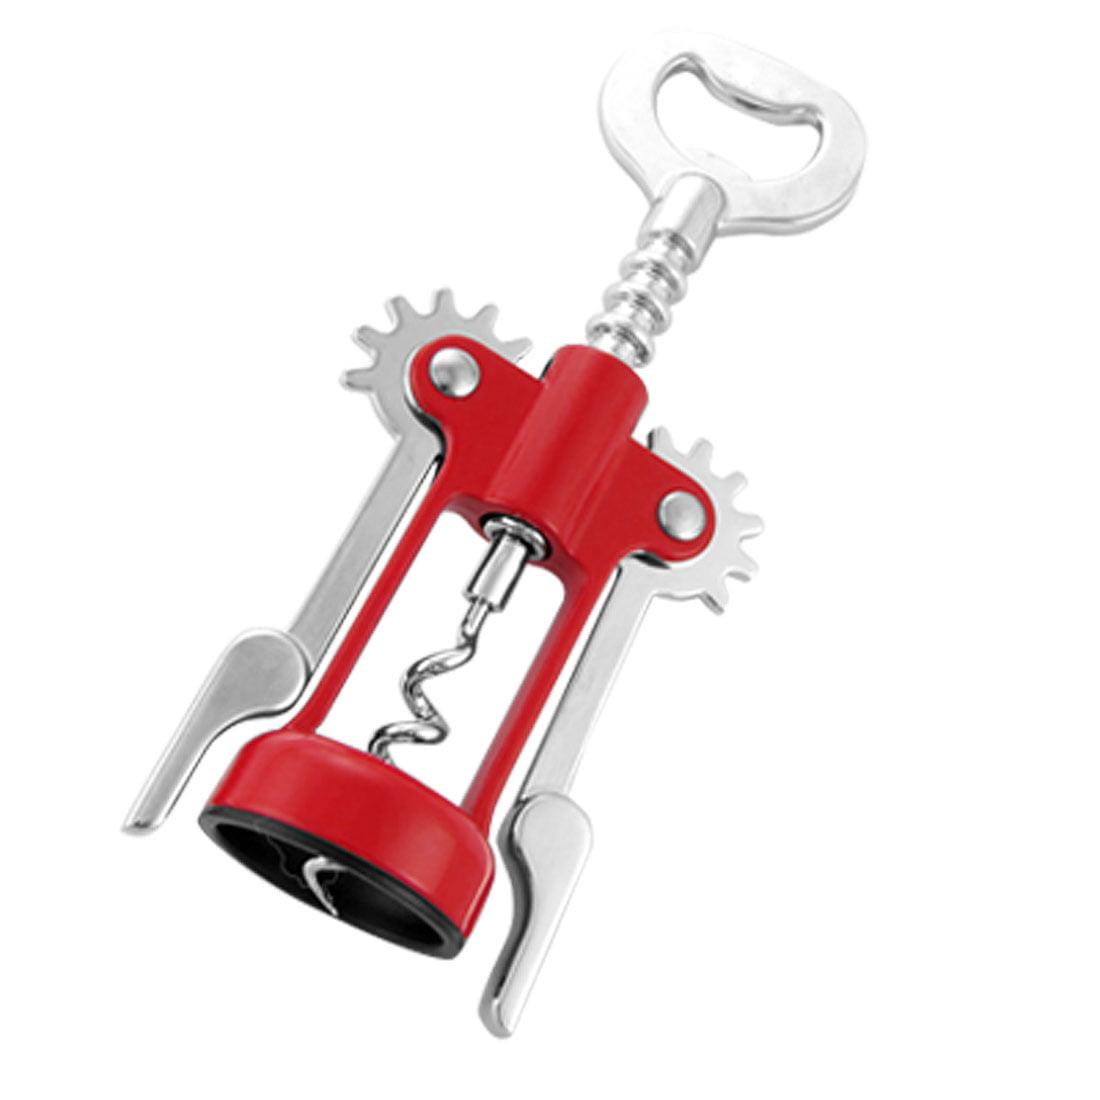 Red Silver Tone Metal Rotatory Corkscrew Bottle Opener